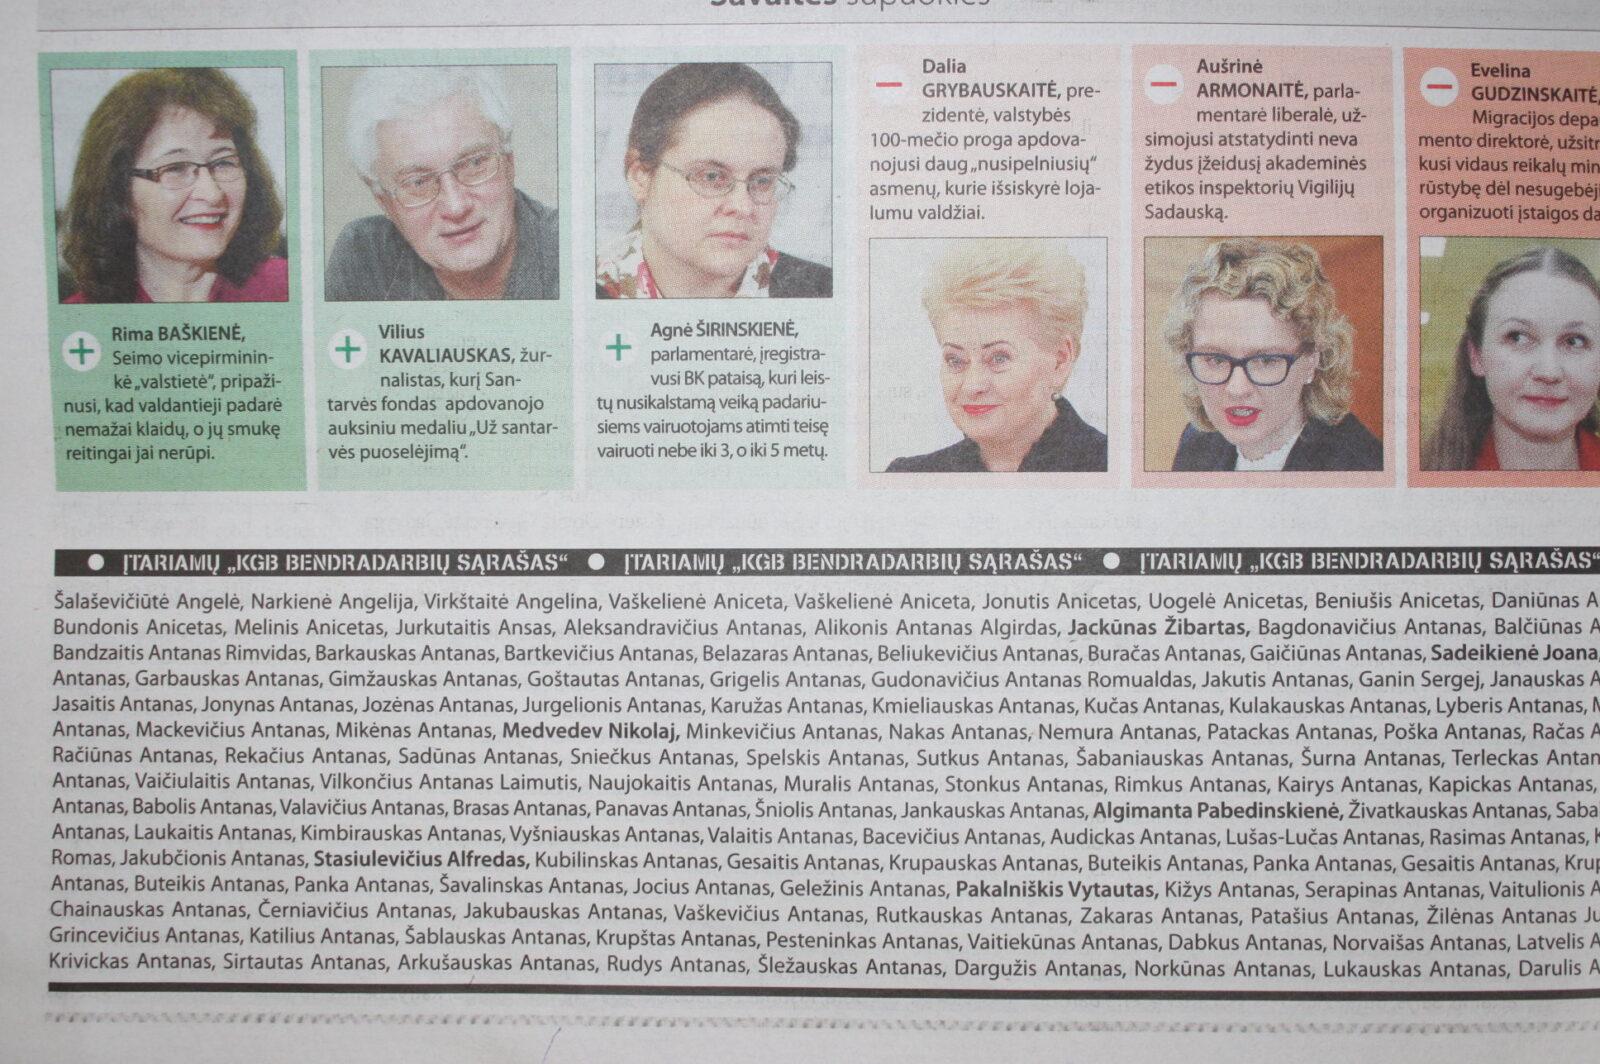 """Tomkaus sąrašas"": Lietuvą valdo KGB"